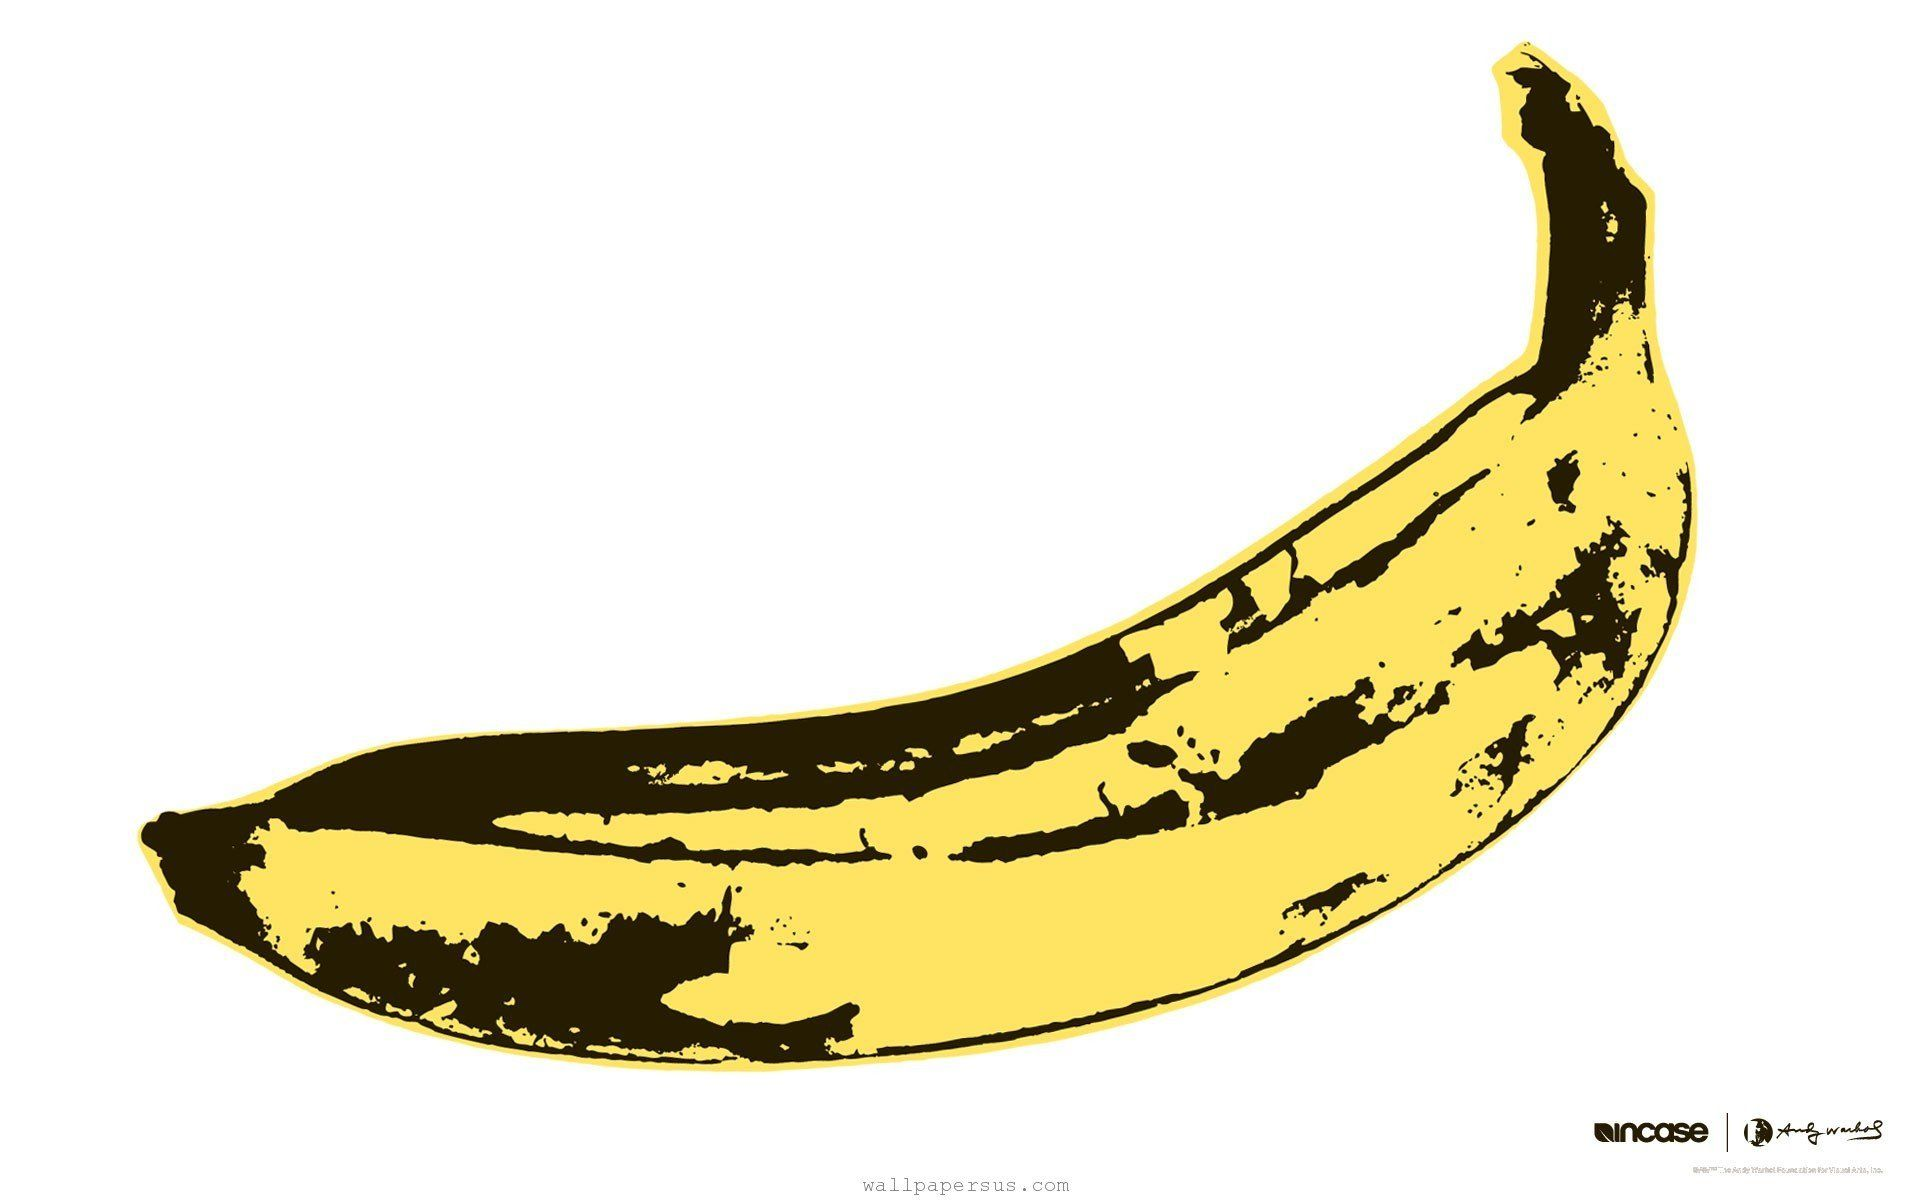 Andy Warhol Banana Widescreen Desktop Mobile Iphone Android Hd Wallpaper And Desktop Andy Warhol Andy Warhol Banana Warhol